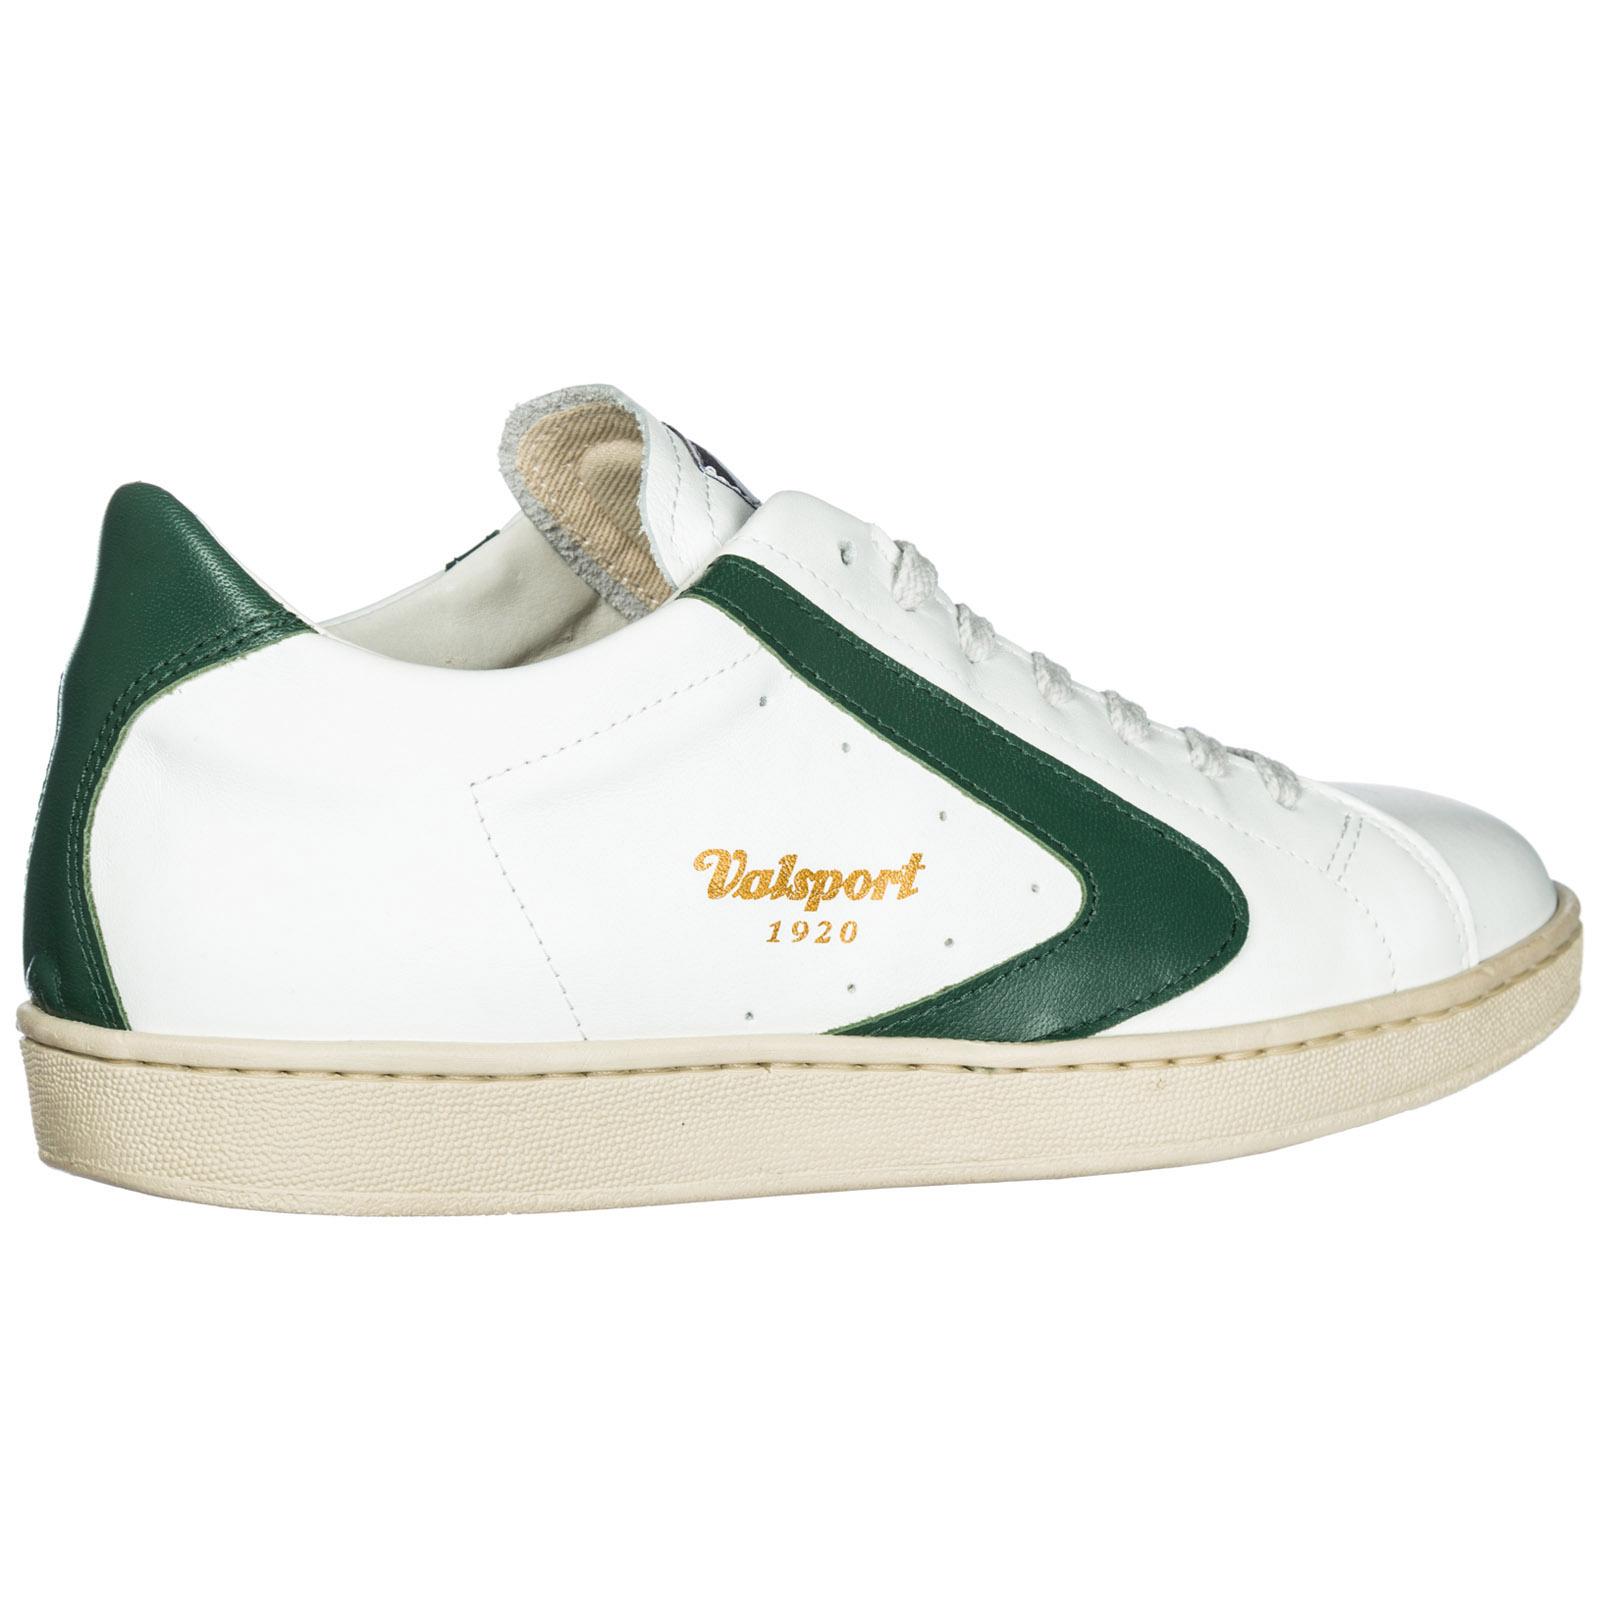 los angeles a4bab 1c588 Scarpe sneakers uomo in pelle tournament